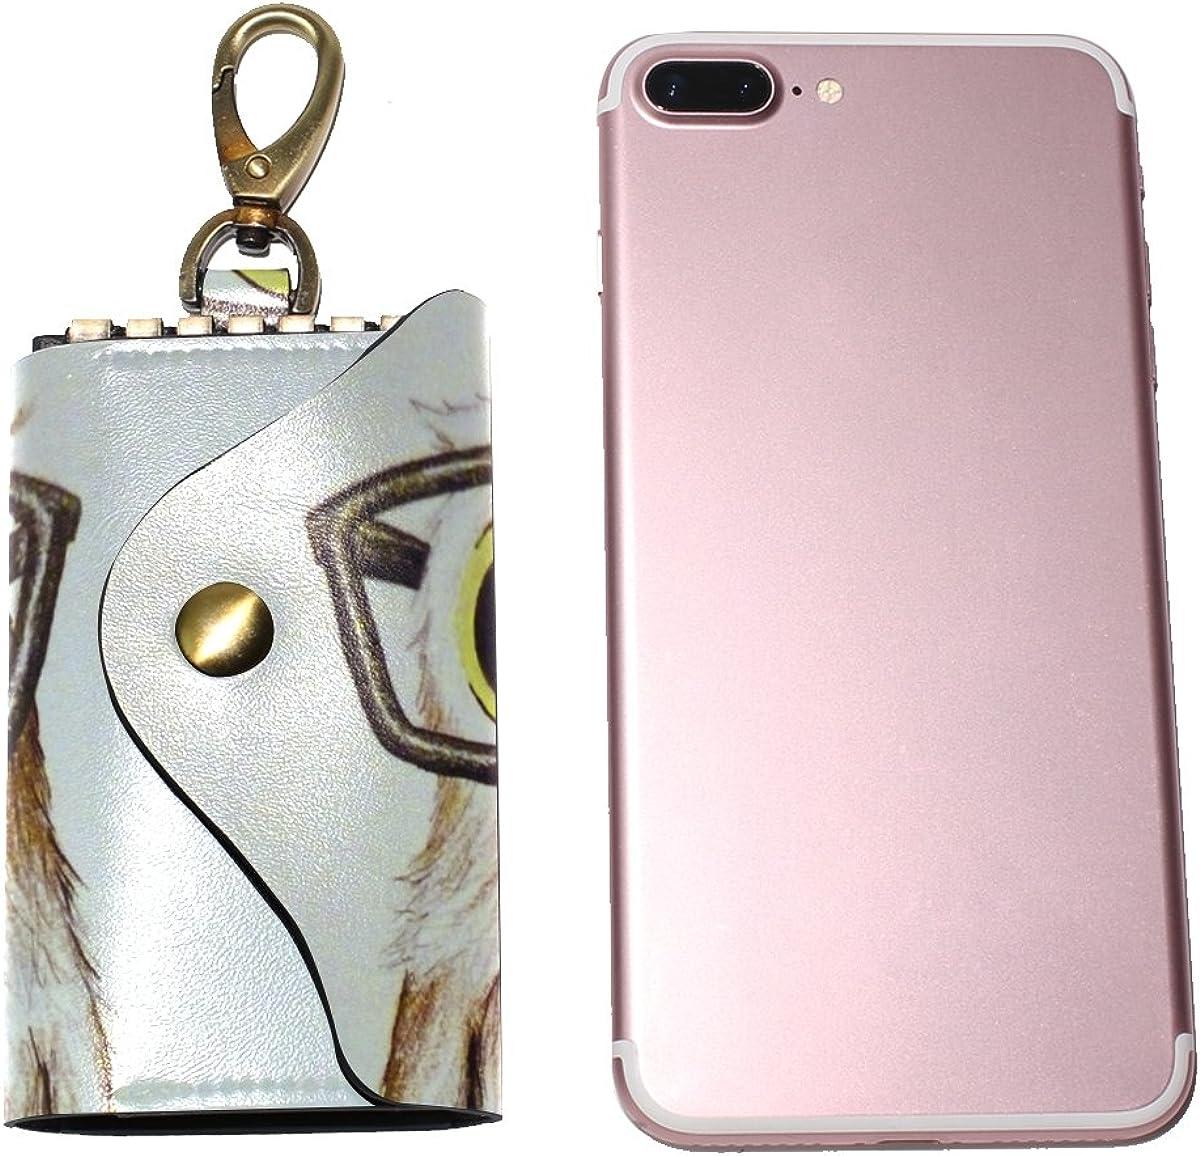 DEYYA Intelectual-Owl Leather Key Case Wallets Unisex Keychain Key Holder with 6 Hooks Snap Closure